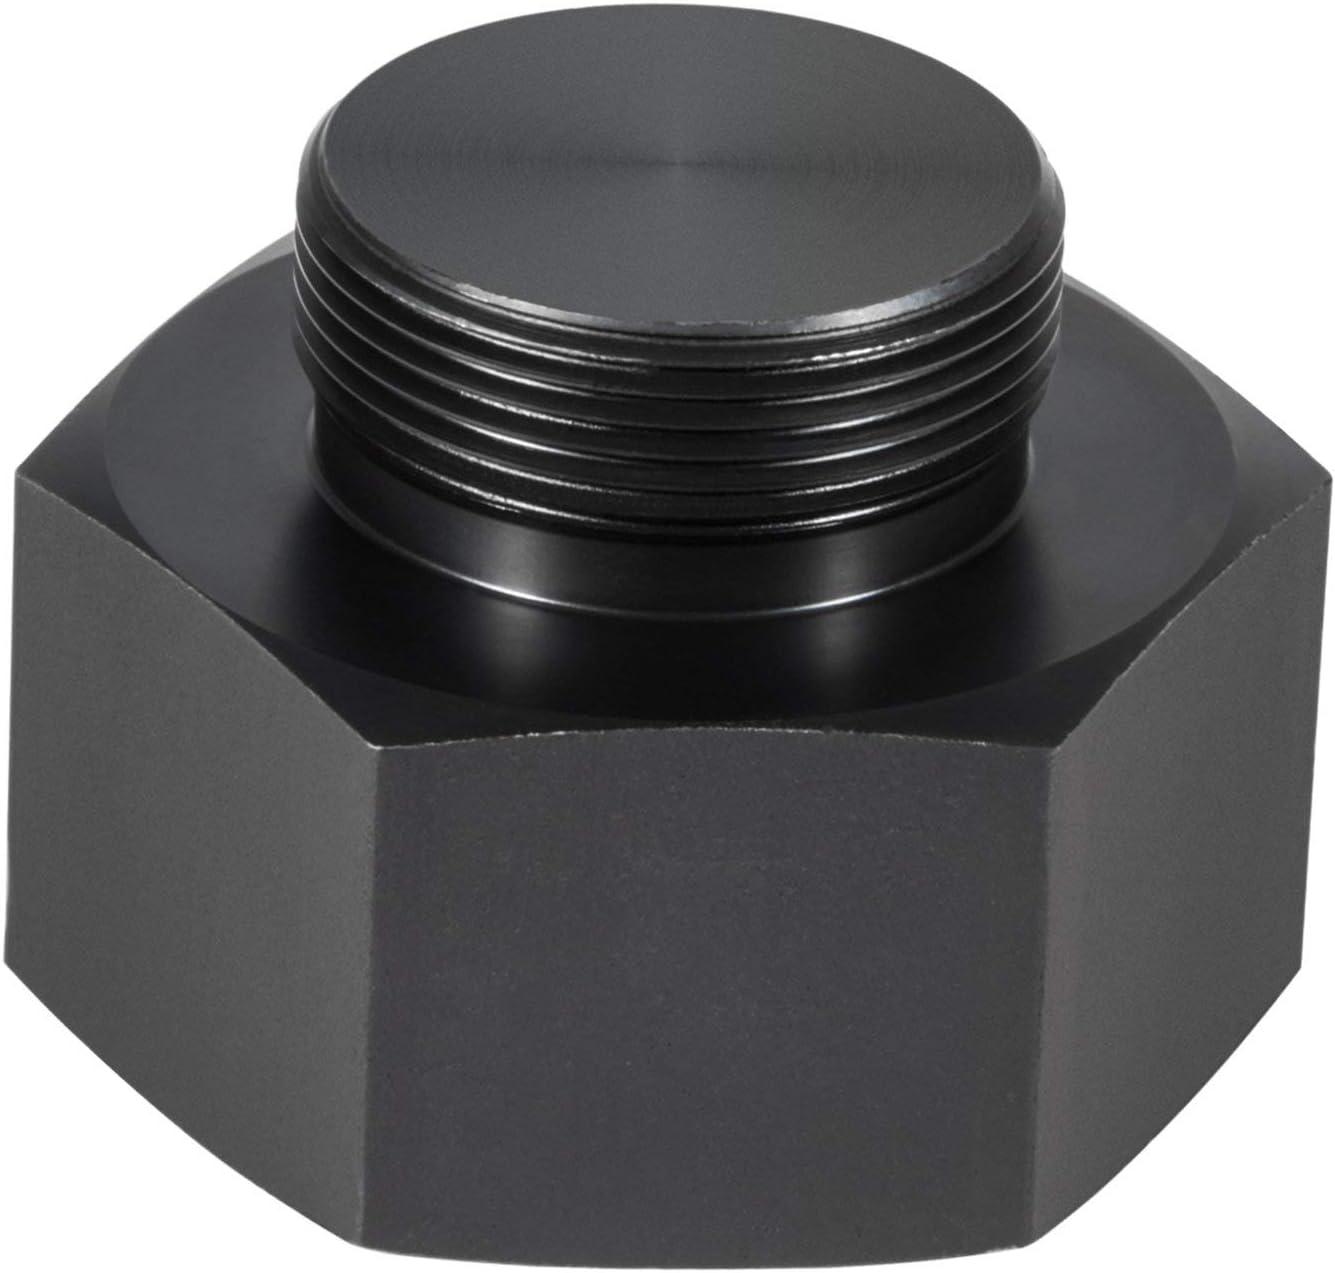 Manicar Ford 6.0L - 7.3L Powerstroke Diesel Mechanical Fan Clutch Adaptor For Ford